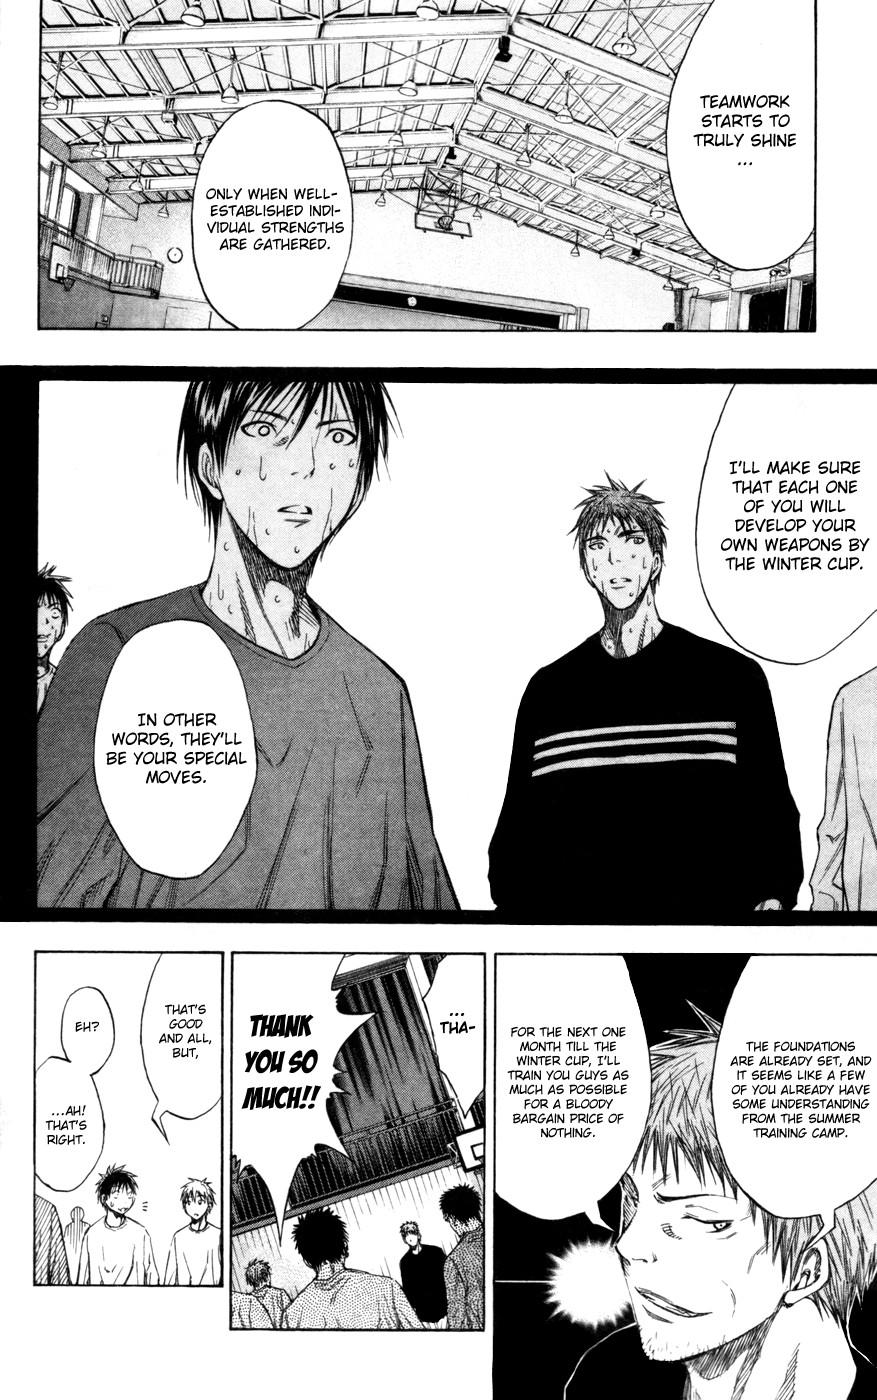 Kuroko no Basket Manga Chapter 111 - Image 18